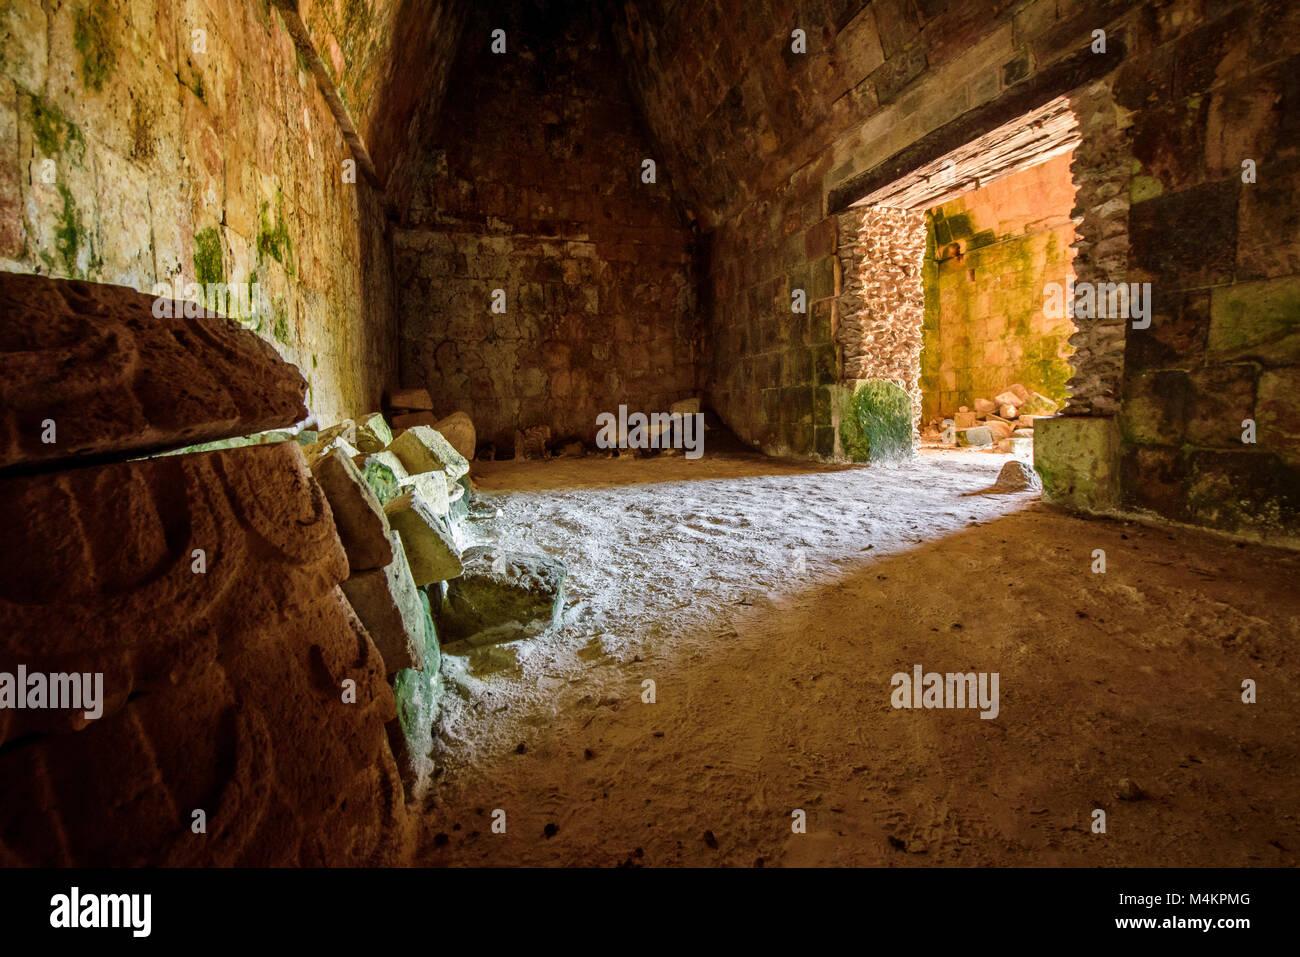 Inside of Palacio del Gobernador-Governor's Palace, Maya archeological site Uxmal, Yucatan Province, Mexico, - Stock Image